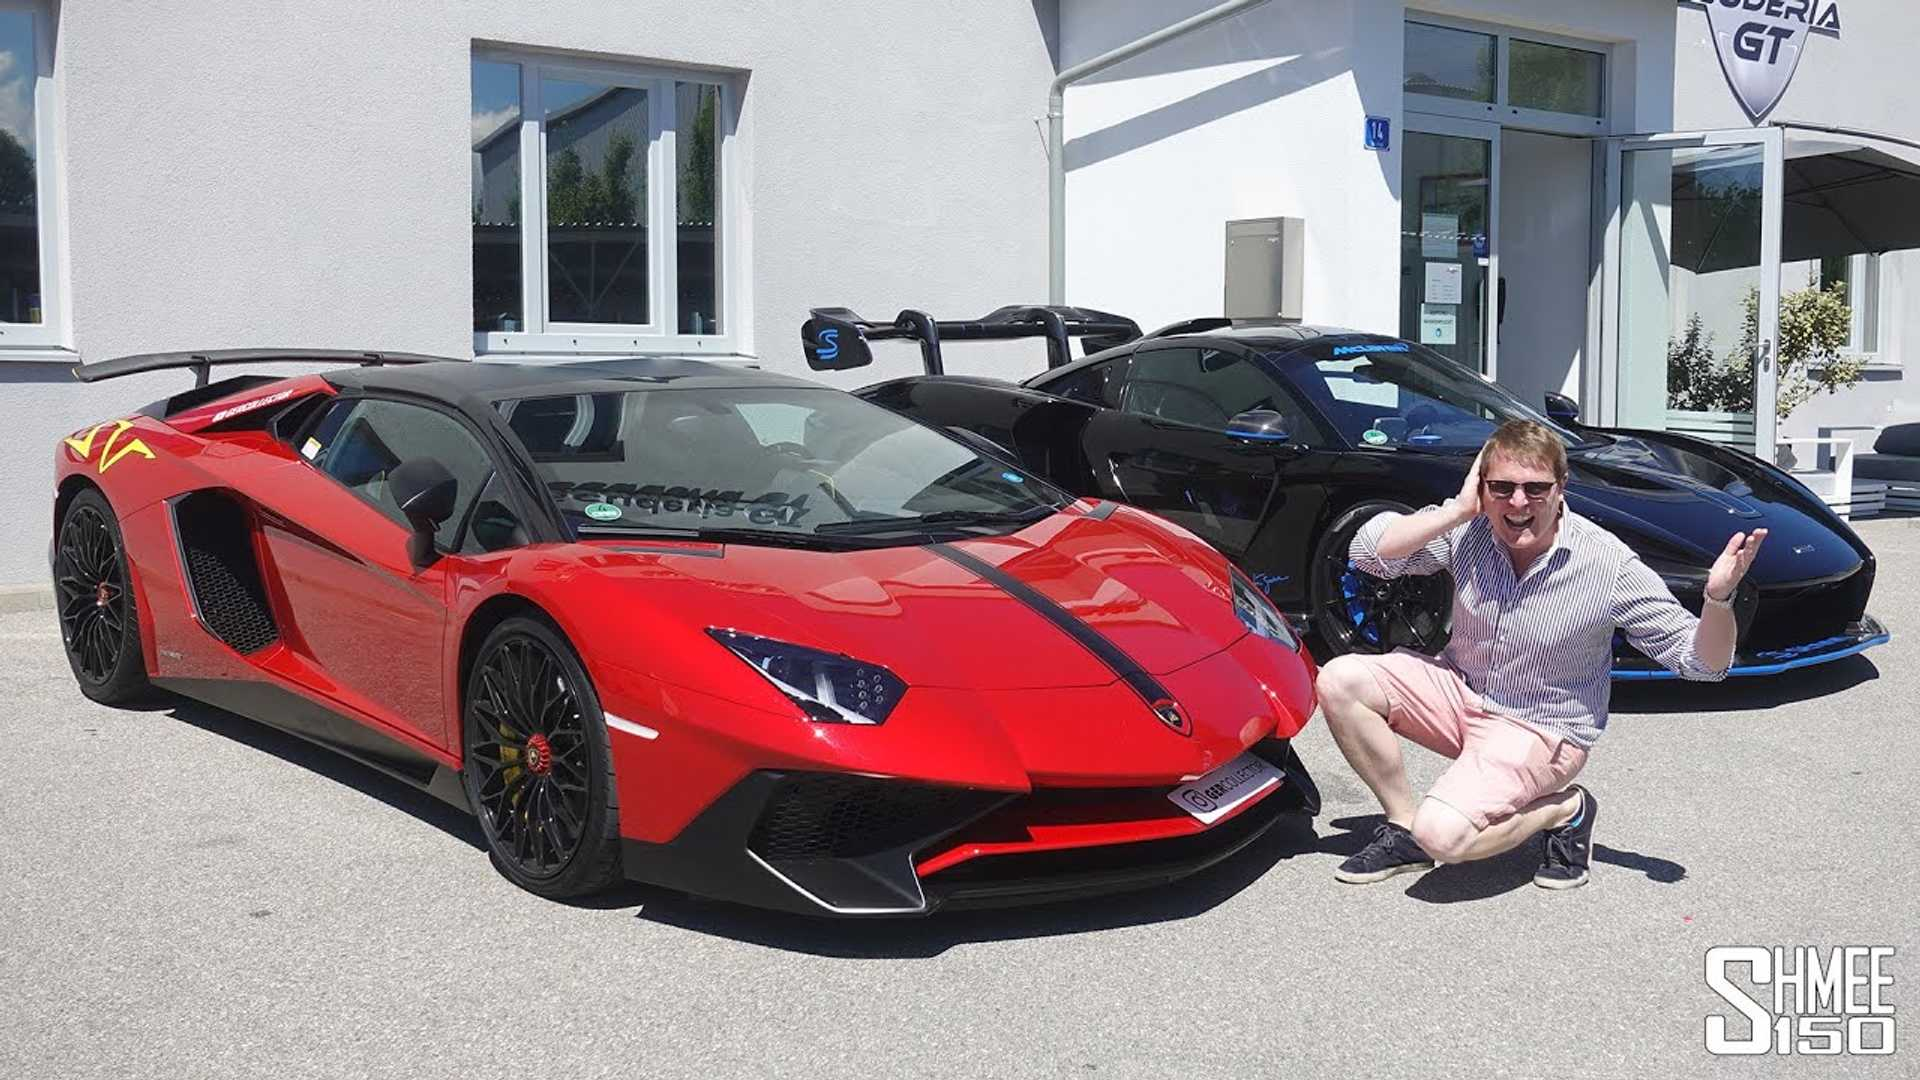 Shmee Drives The Loudest Lamborghini Aventador Sv In The World